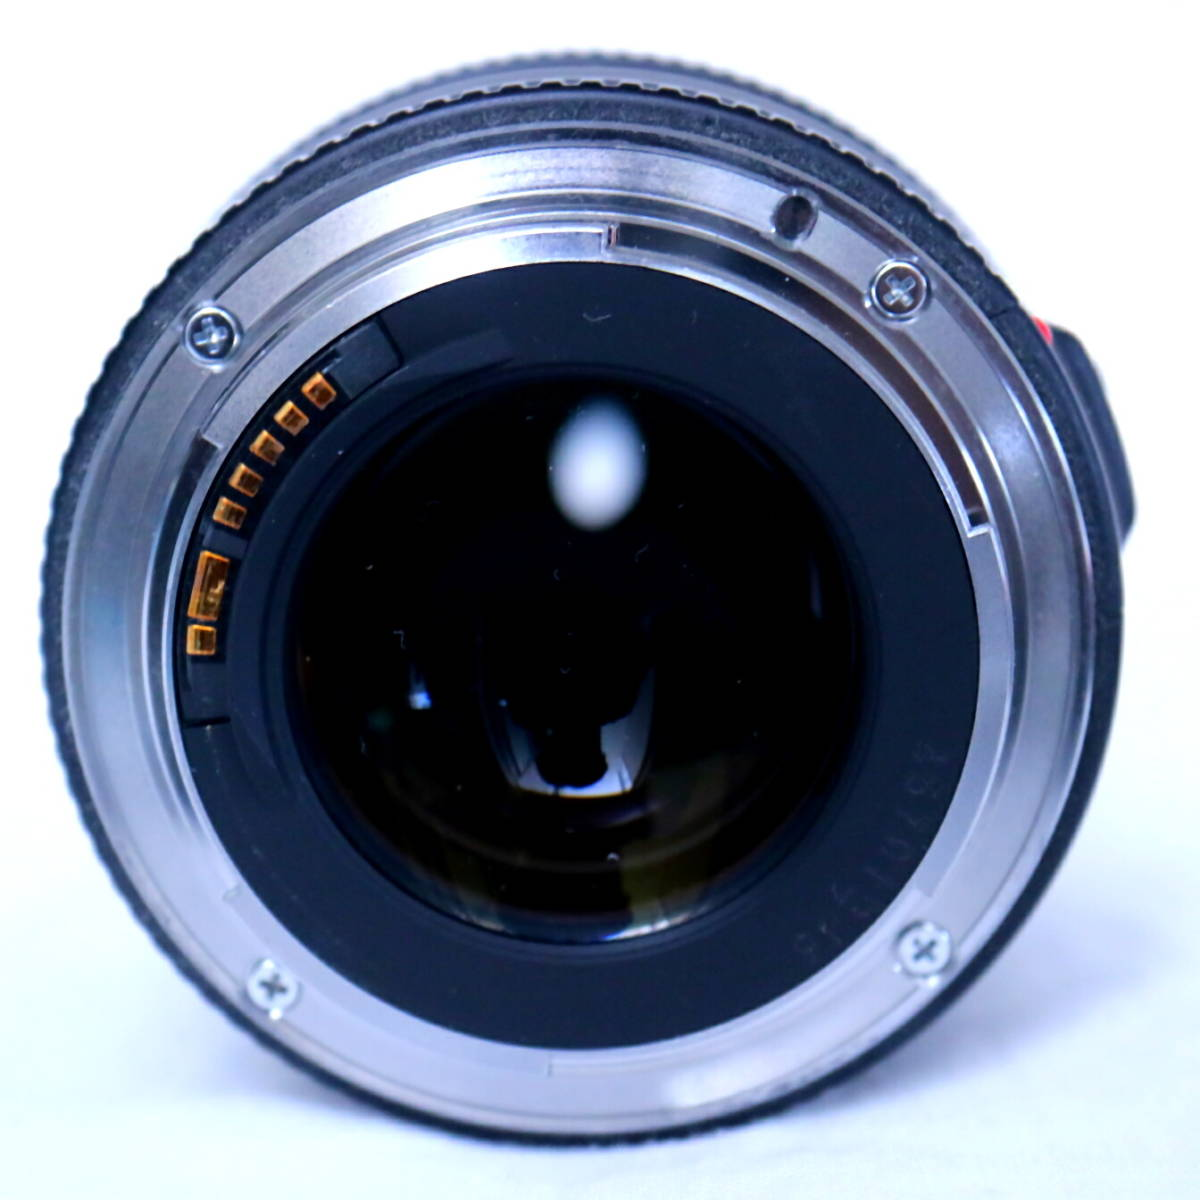 Canon EF85mm f1.8 USM 【極美品】ワンオーナー品 フルサイズ対応 高性能単焦点レンズ キヤノン_画像5